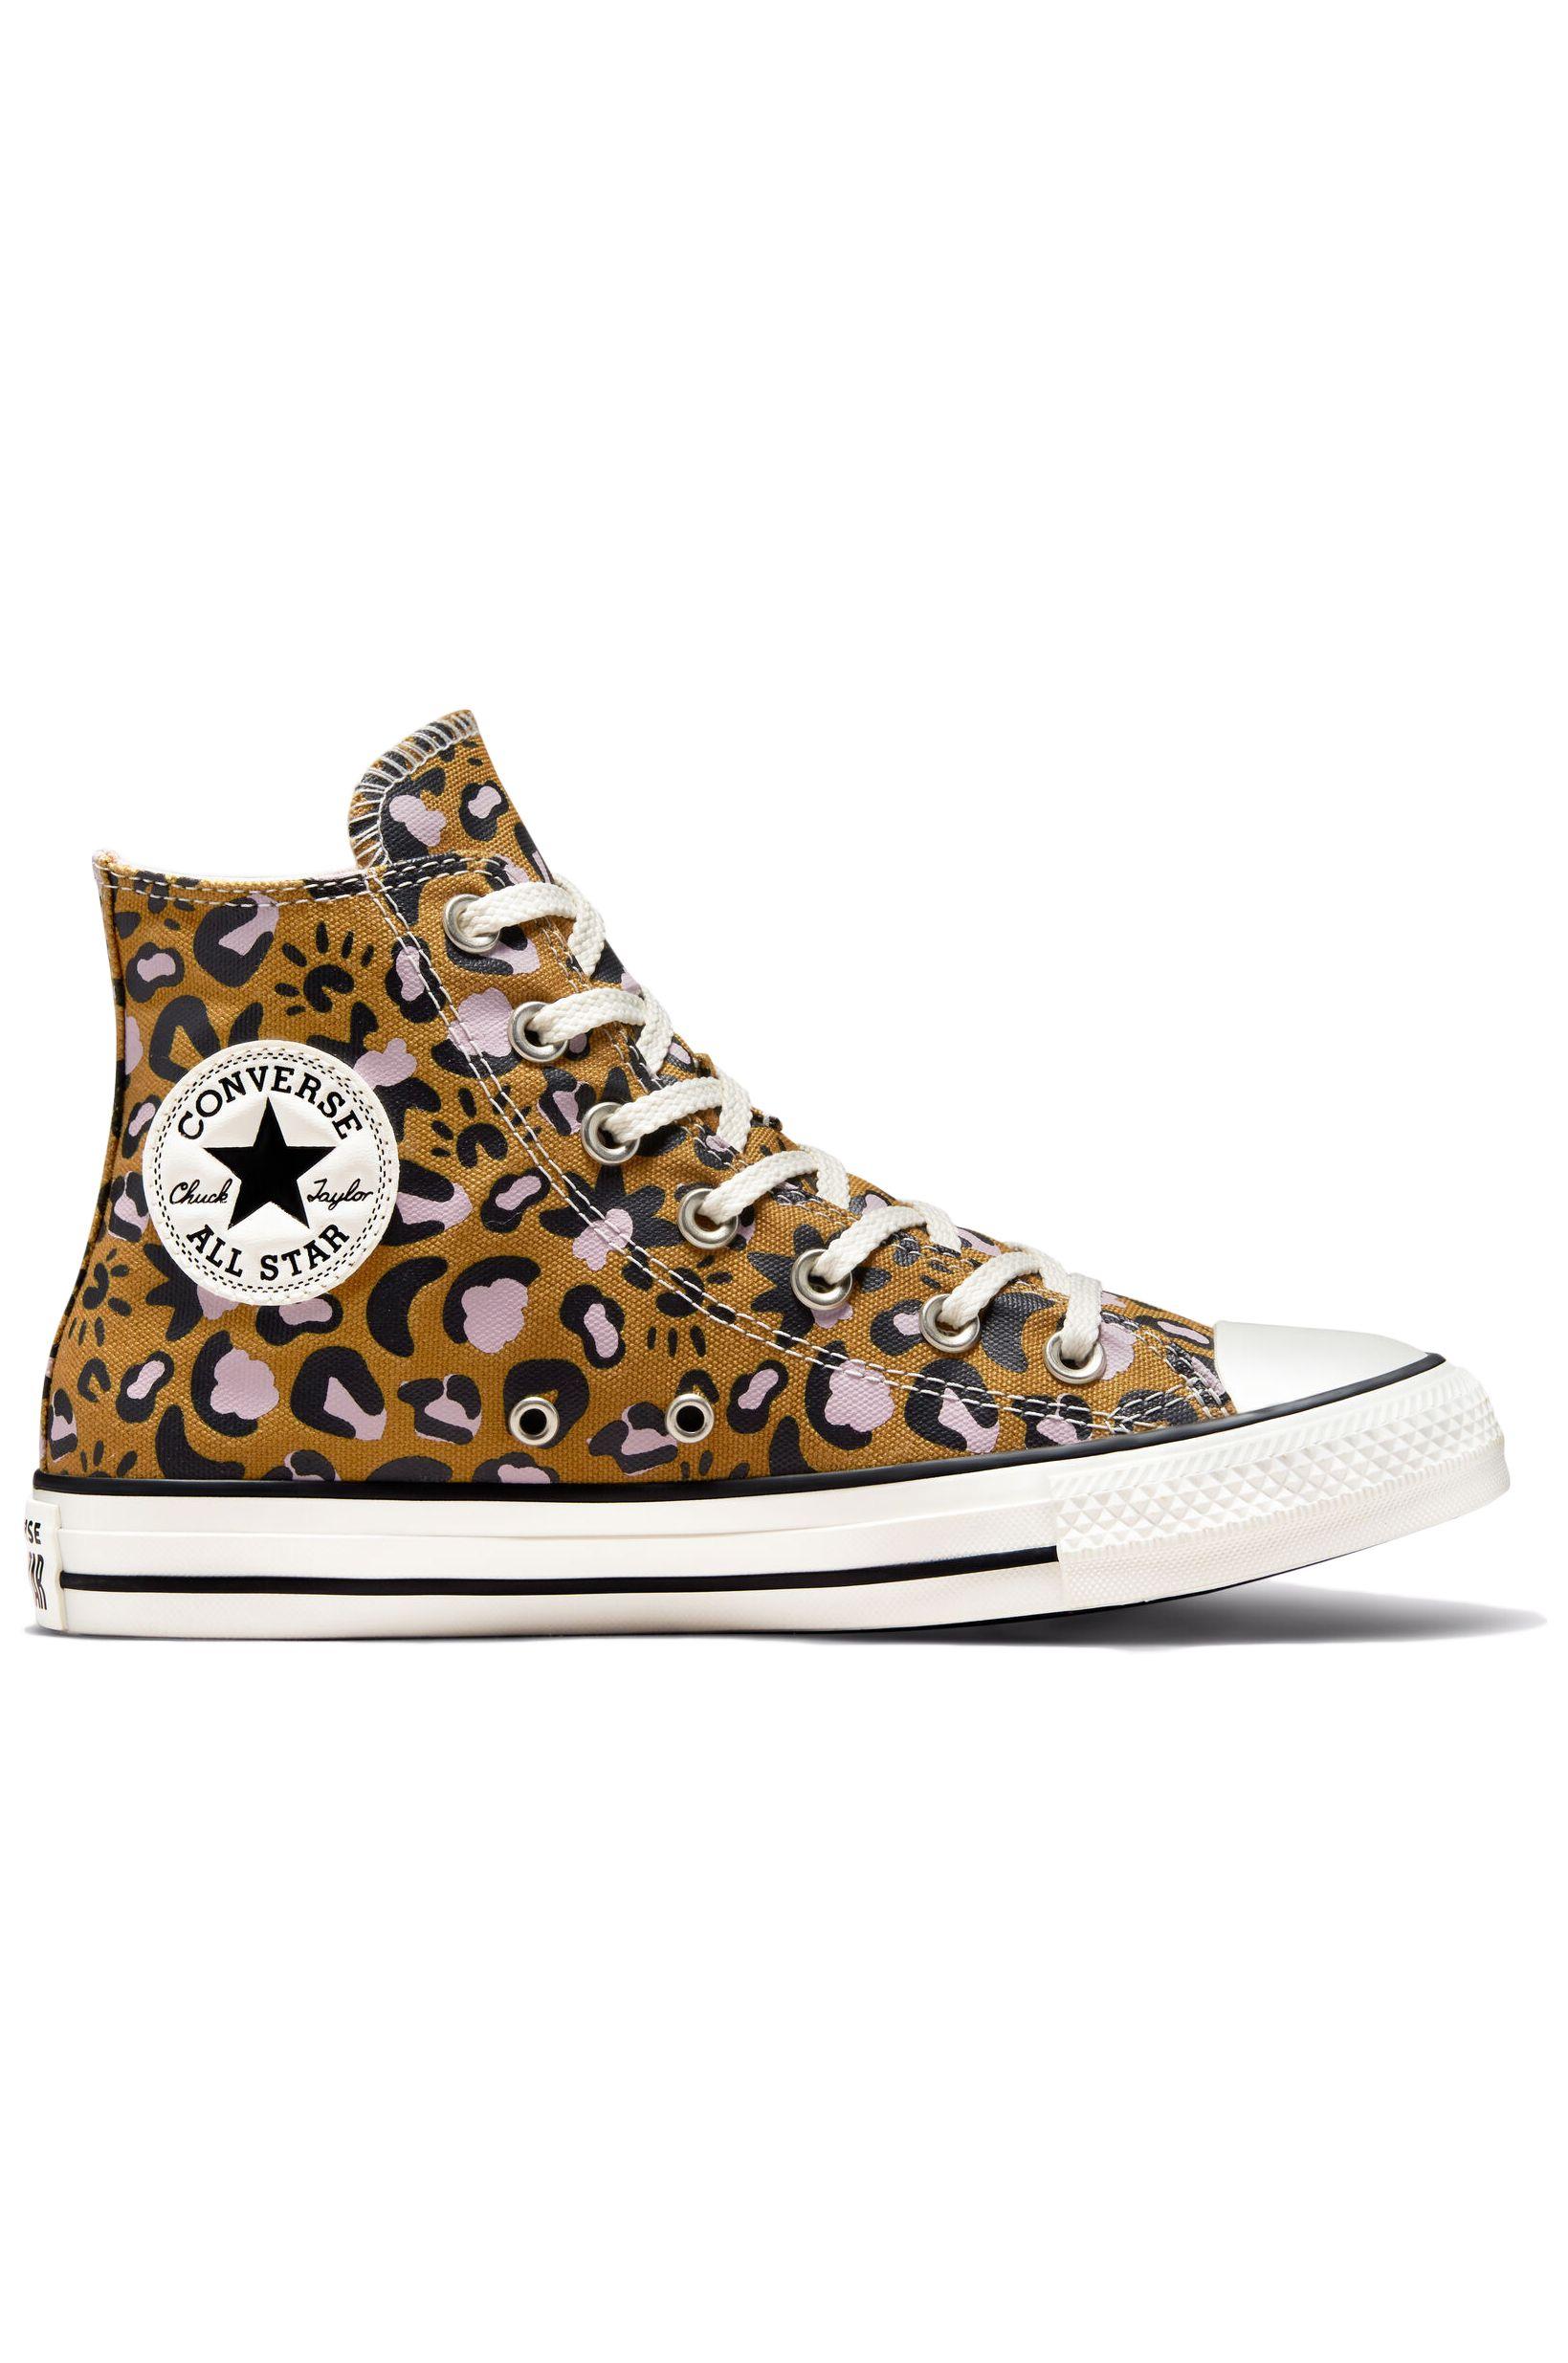 Converse Shoes CHUCK TAYLOR ALL STAR HI Wheat/Black/Pink